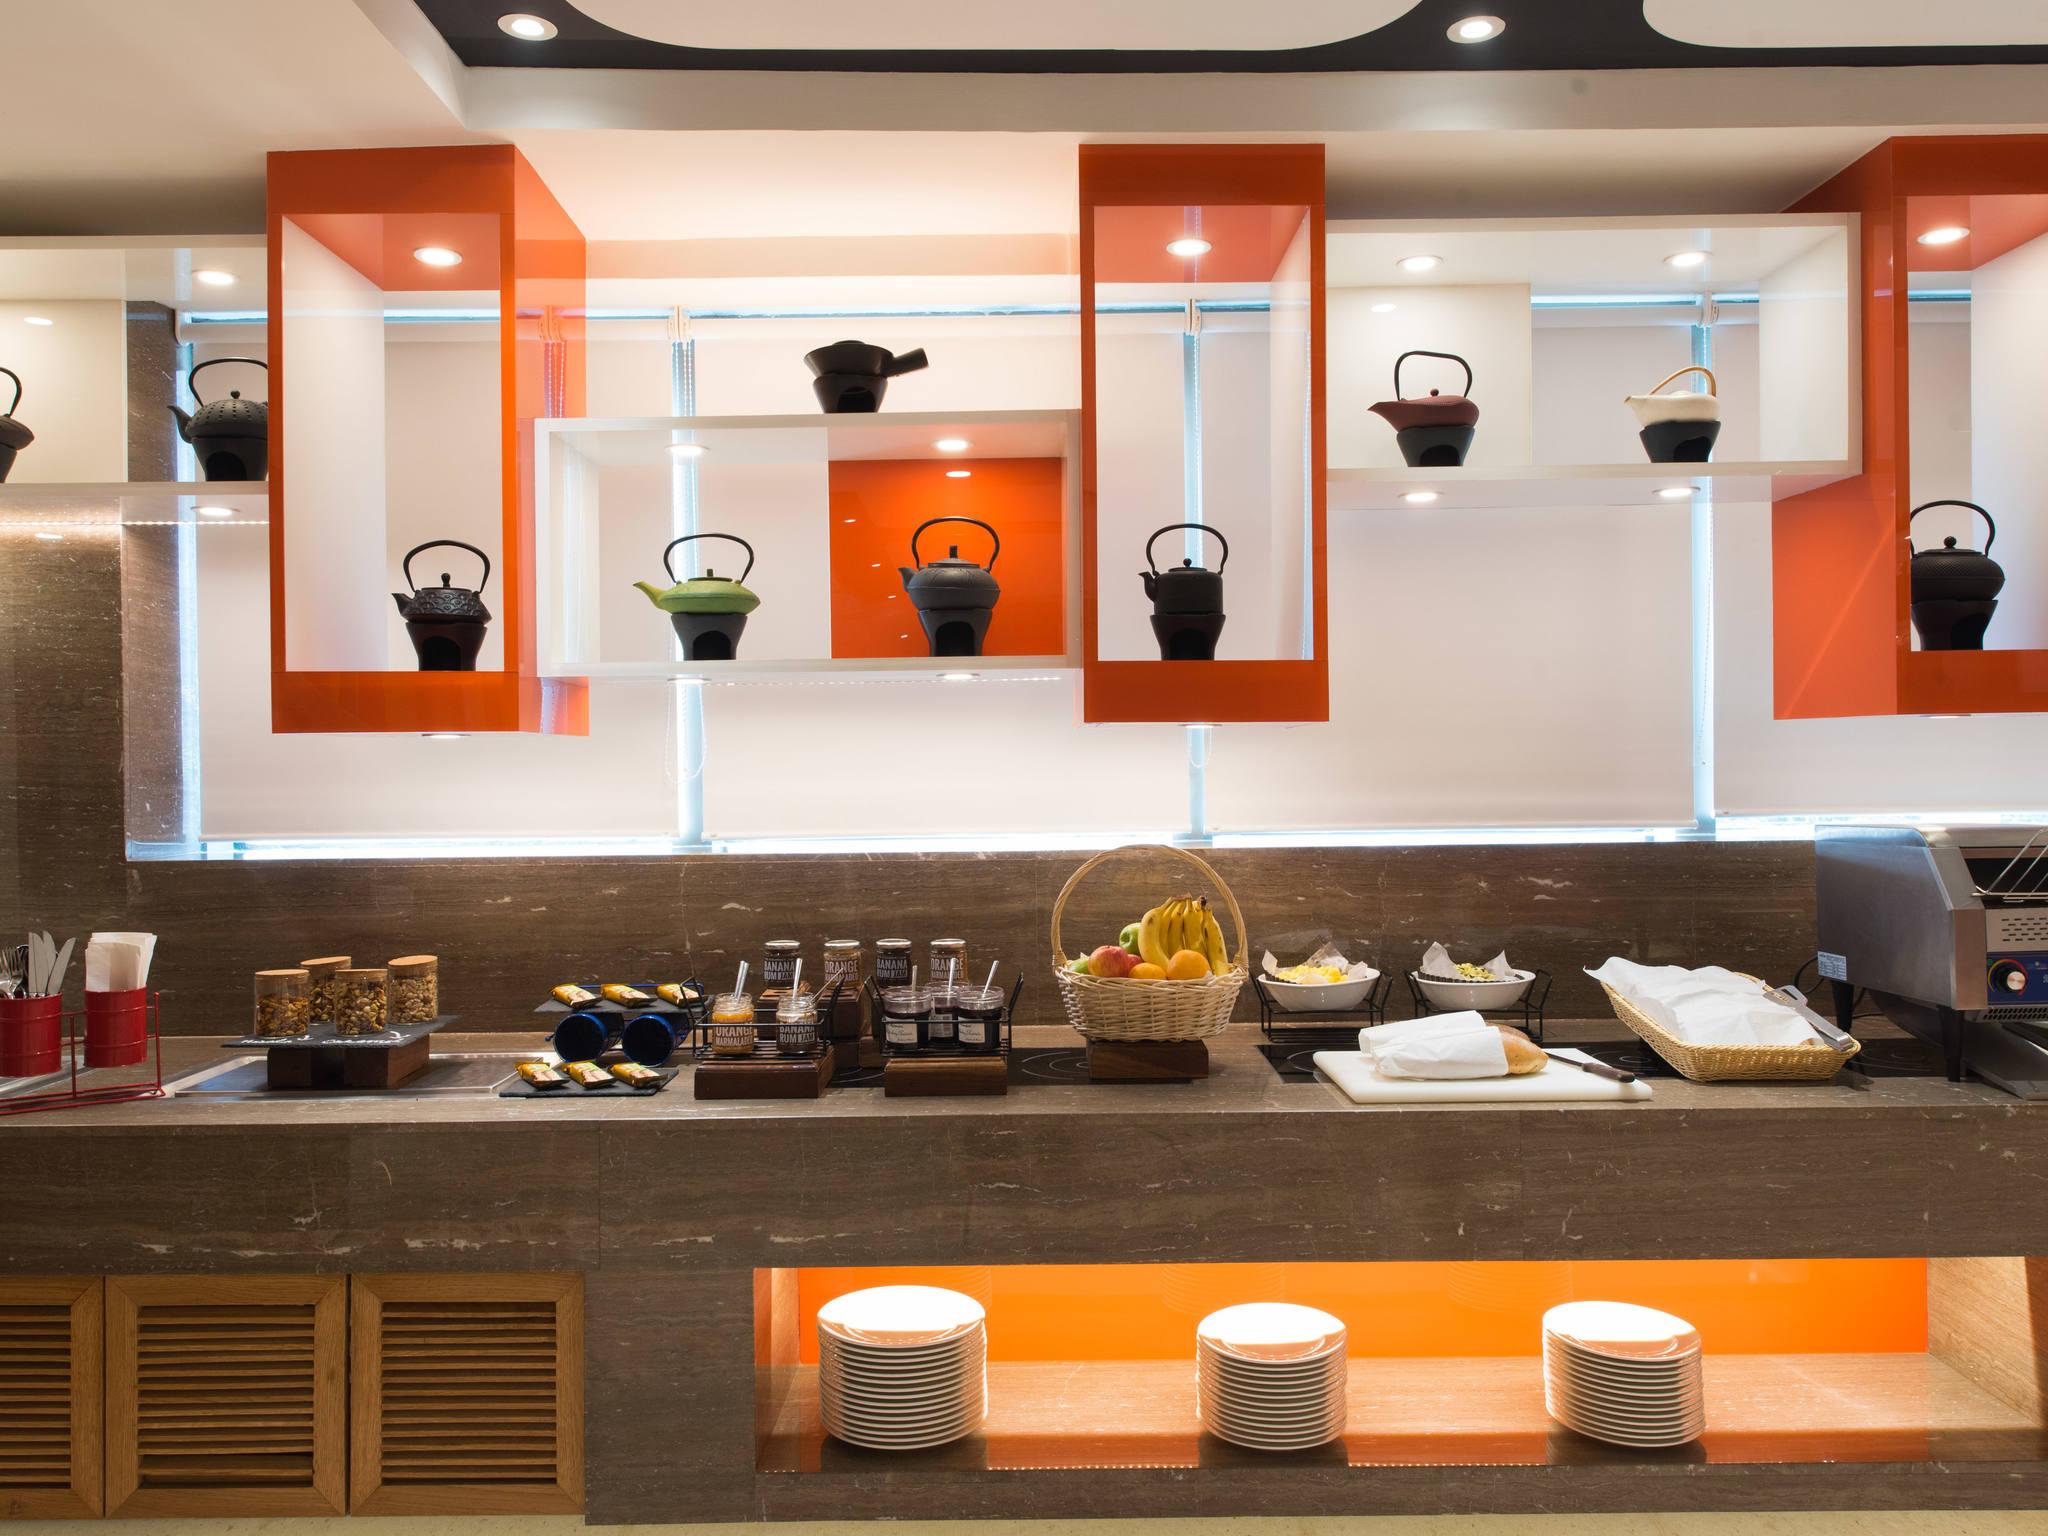 kitchen aid tv offer full hotels 宜必思德里机场酒店 位于新德里航空城的酒店 ibis com 其他礼遇 宜必思新德里航空城酒店 查看价格